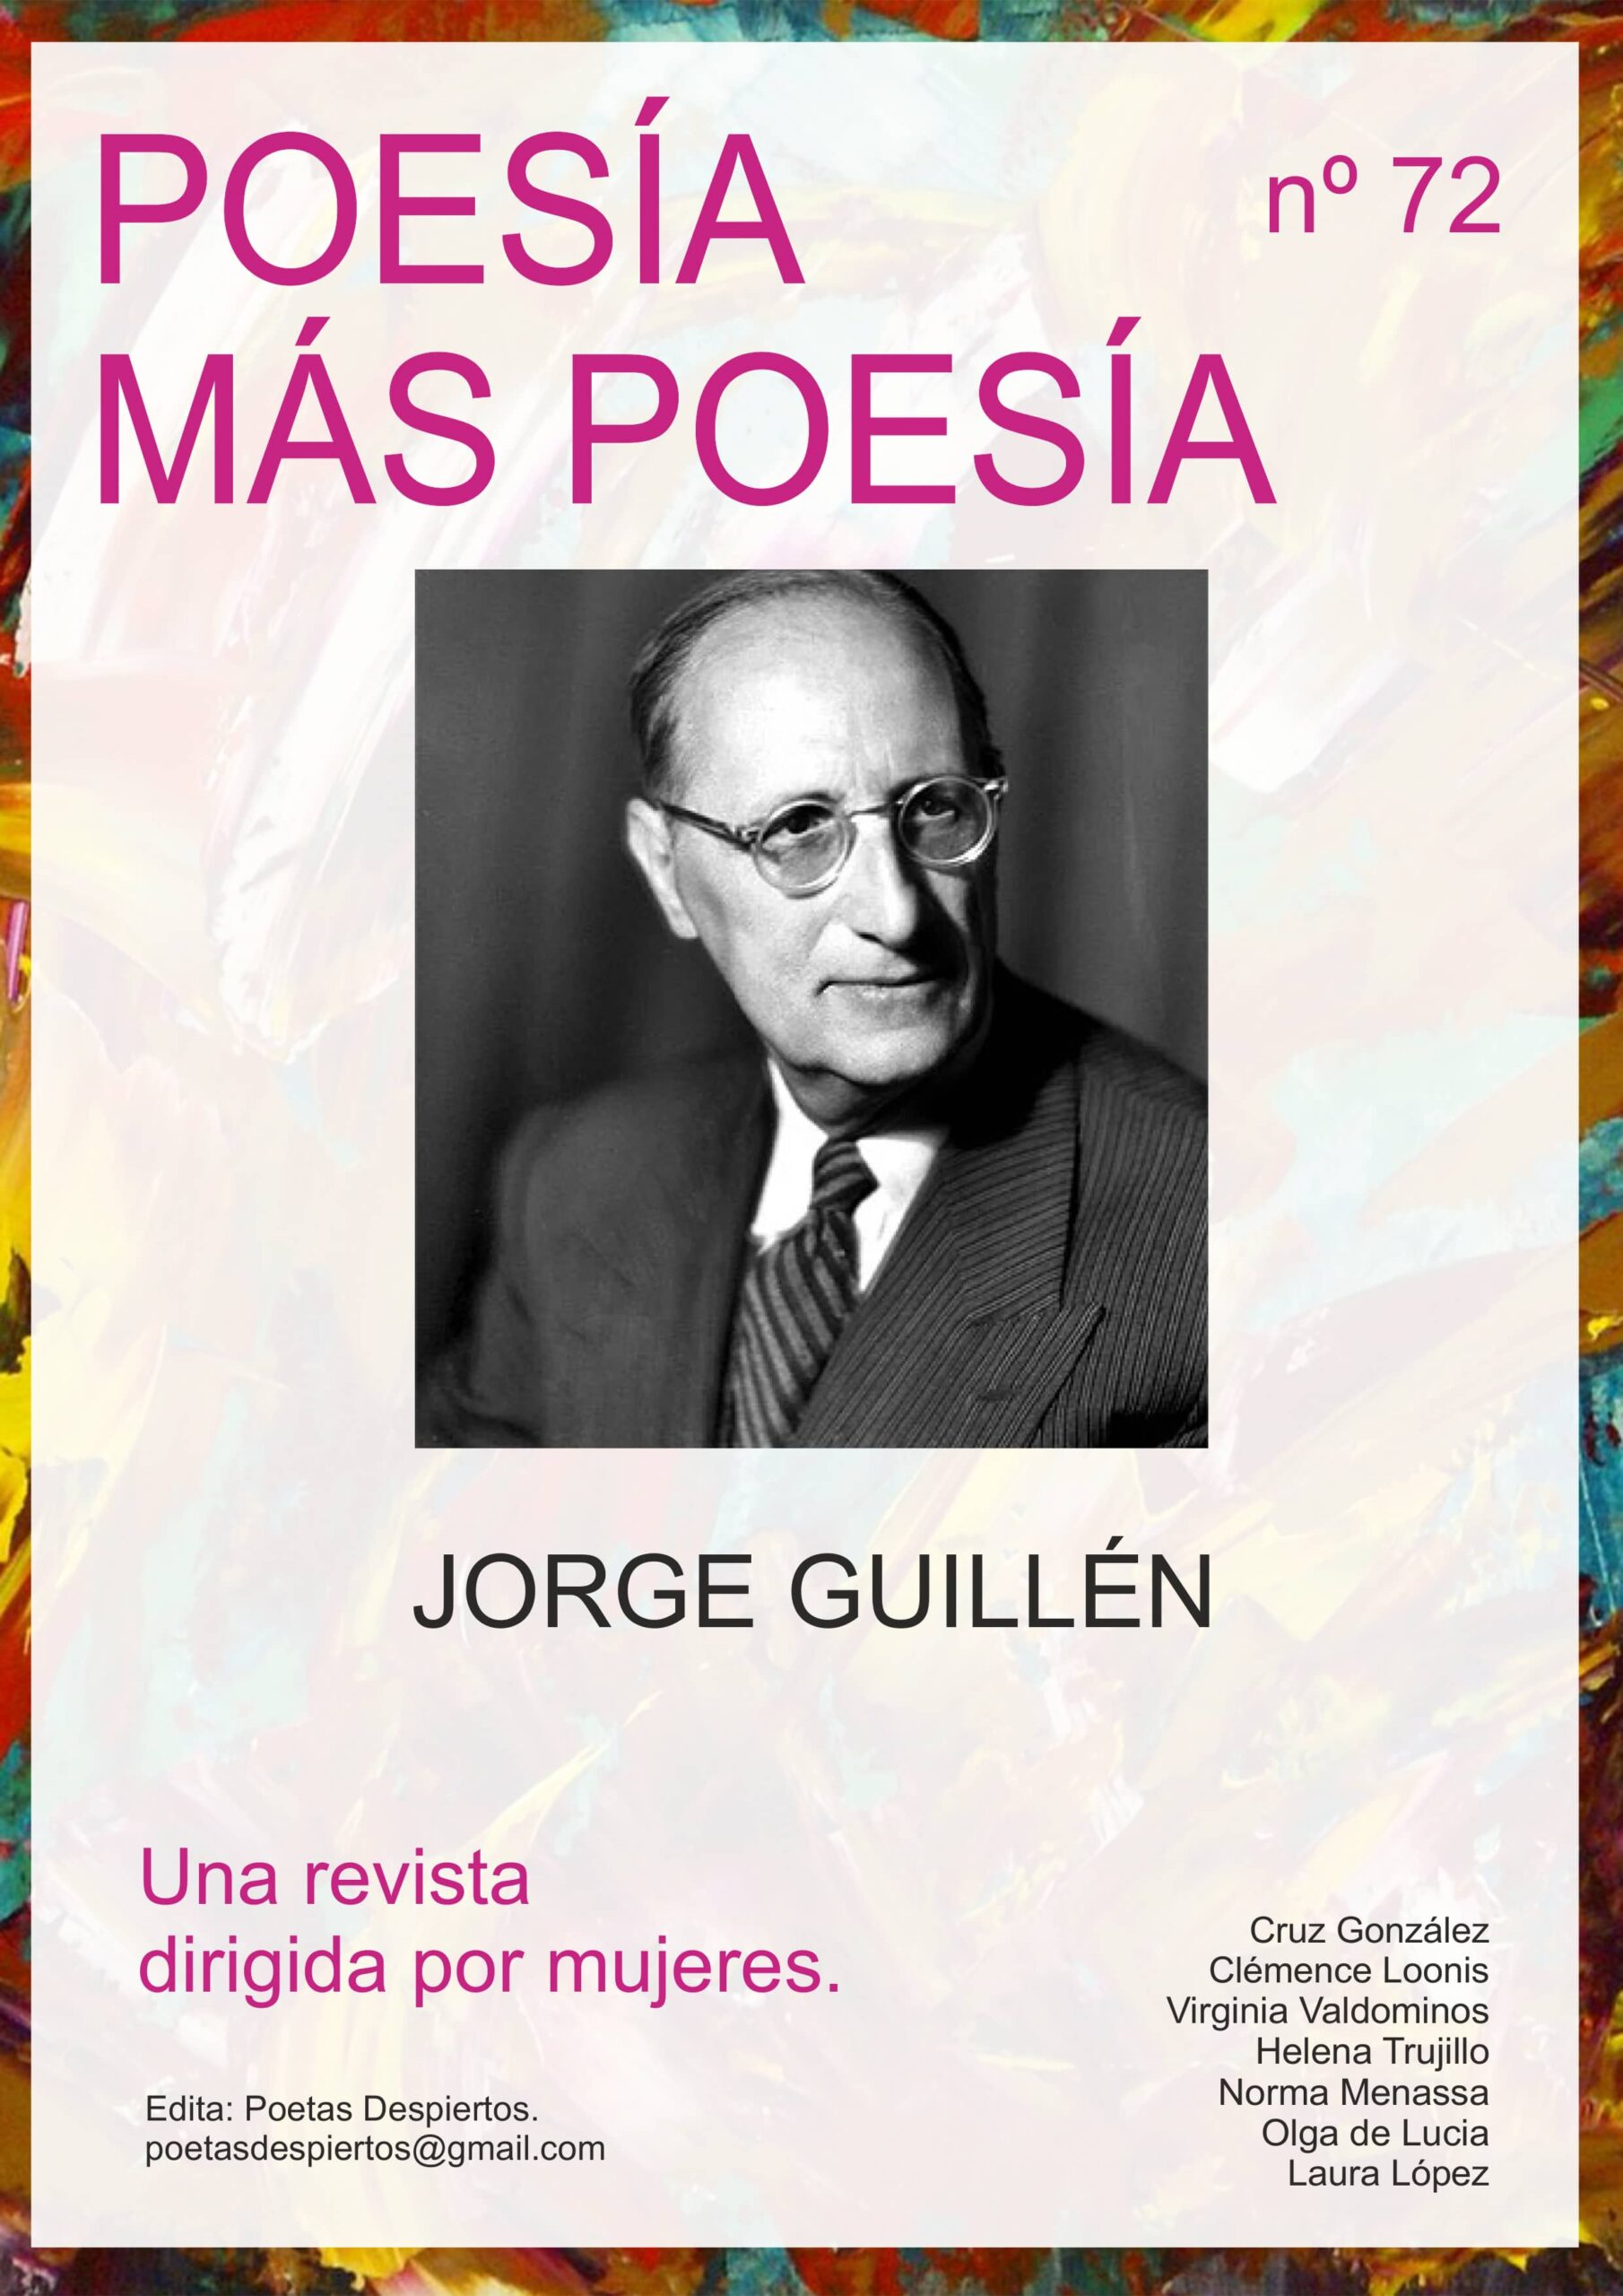 revista poesia mas poesia poeta jorge guillen generacion del 27 scaled - Poesia Online